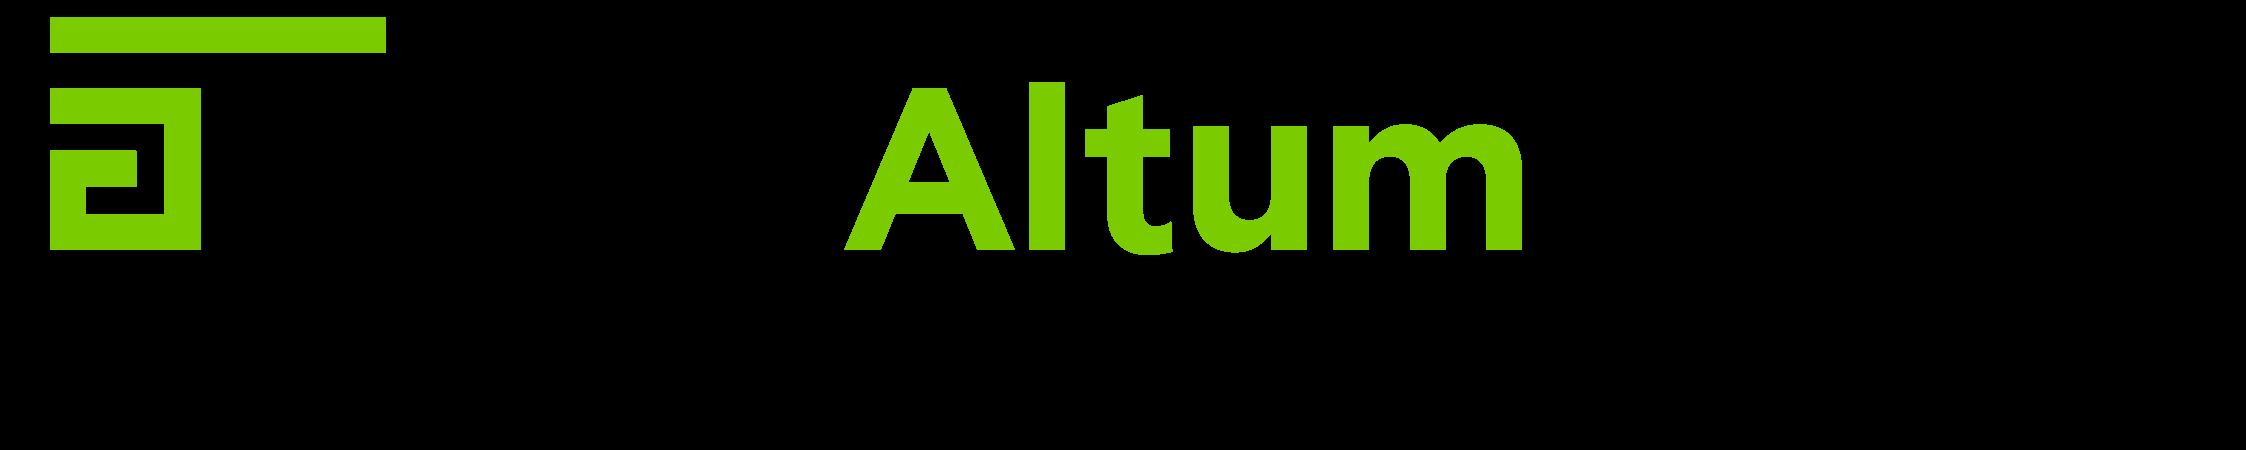 Altum Group